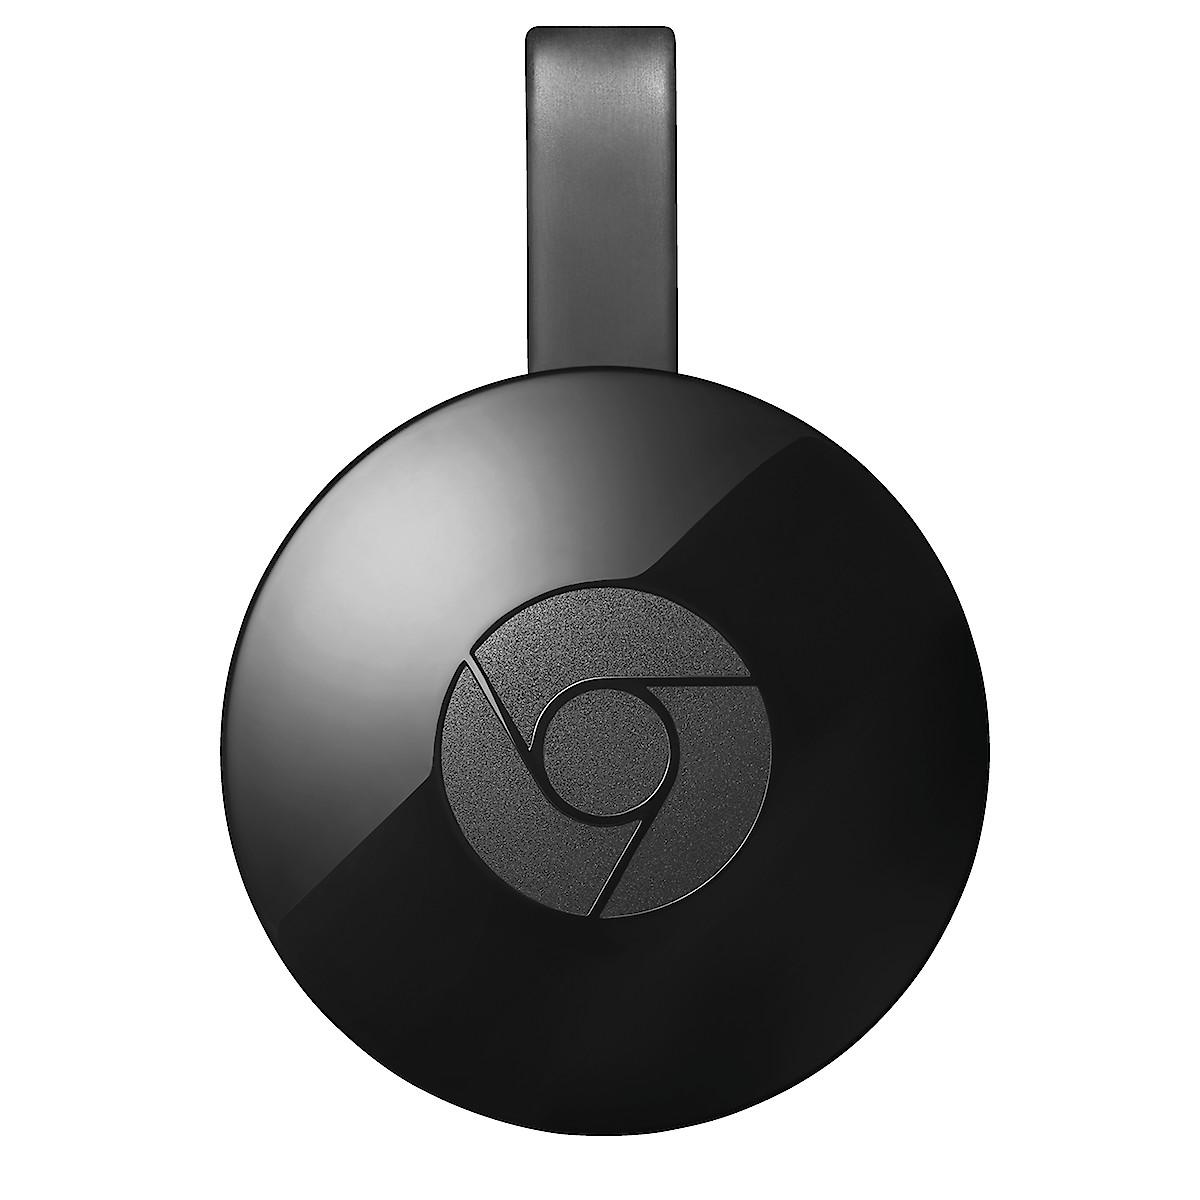 Media-Player Google Chromecast